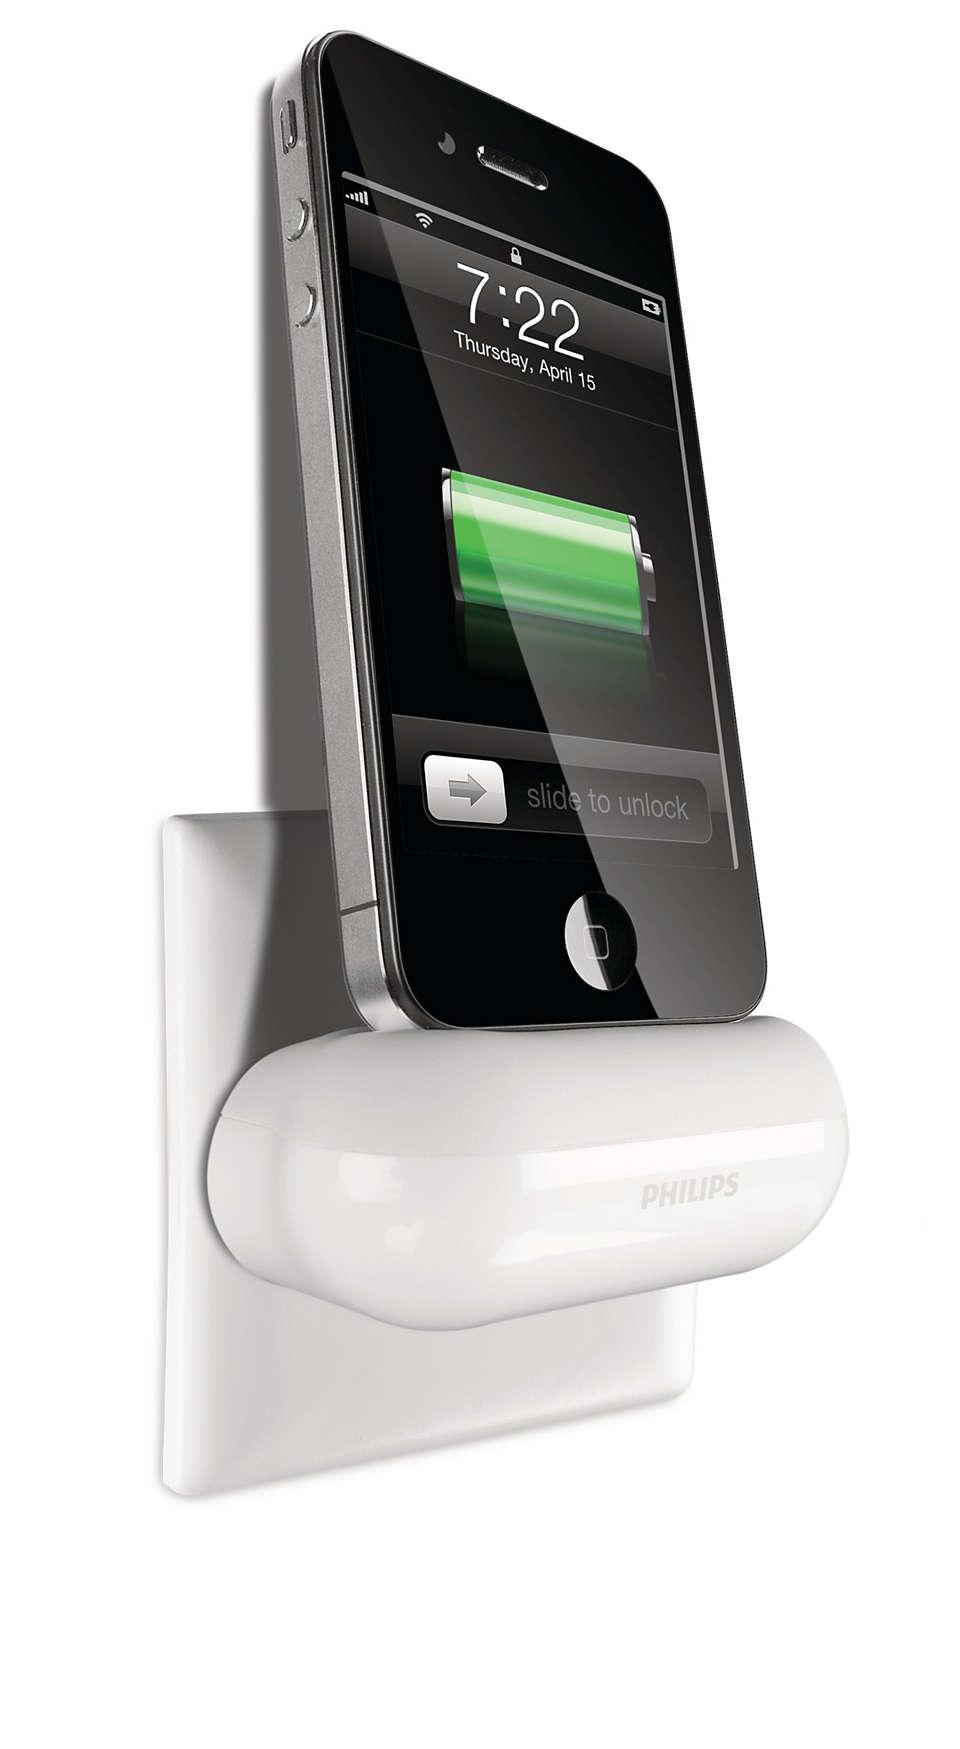 Plug-in charging dock